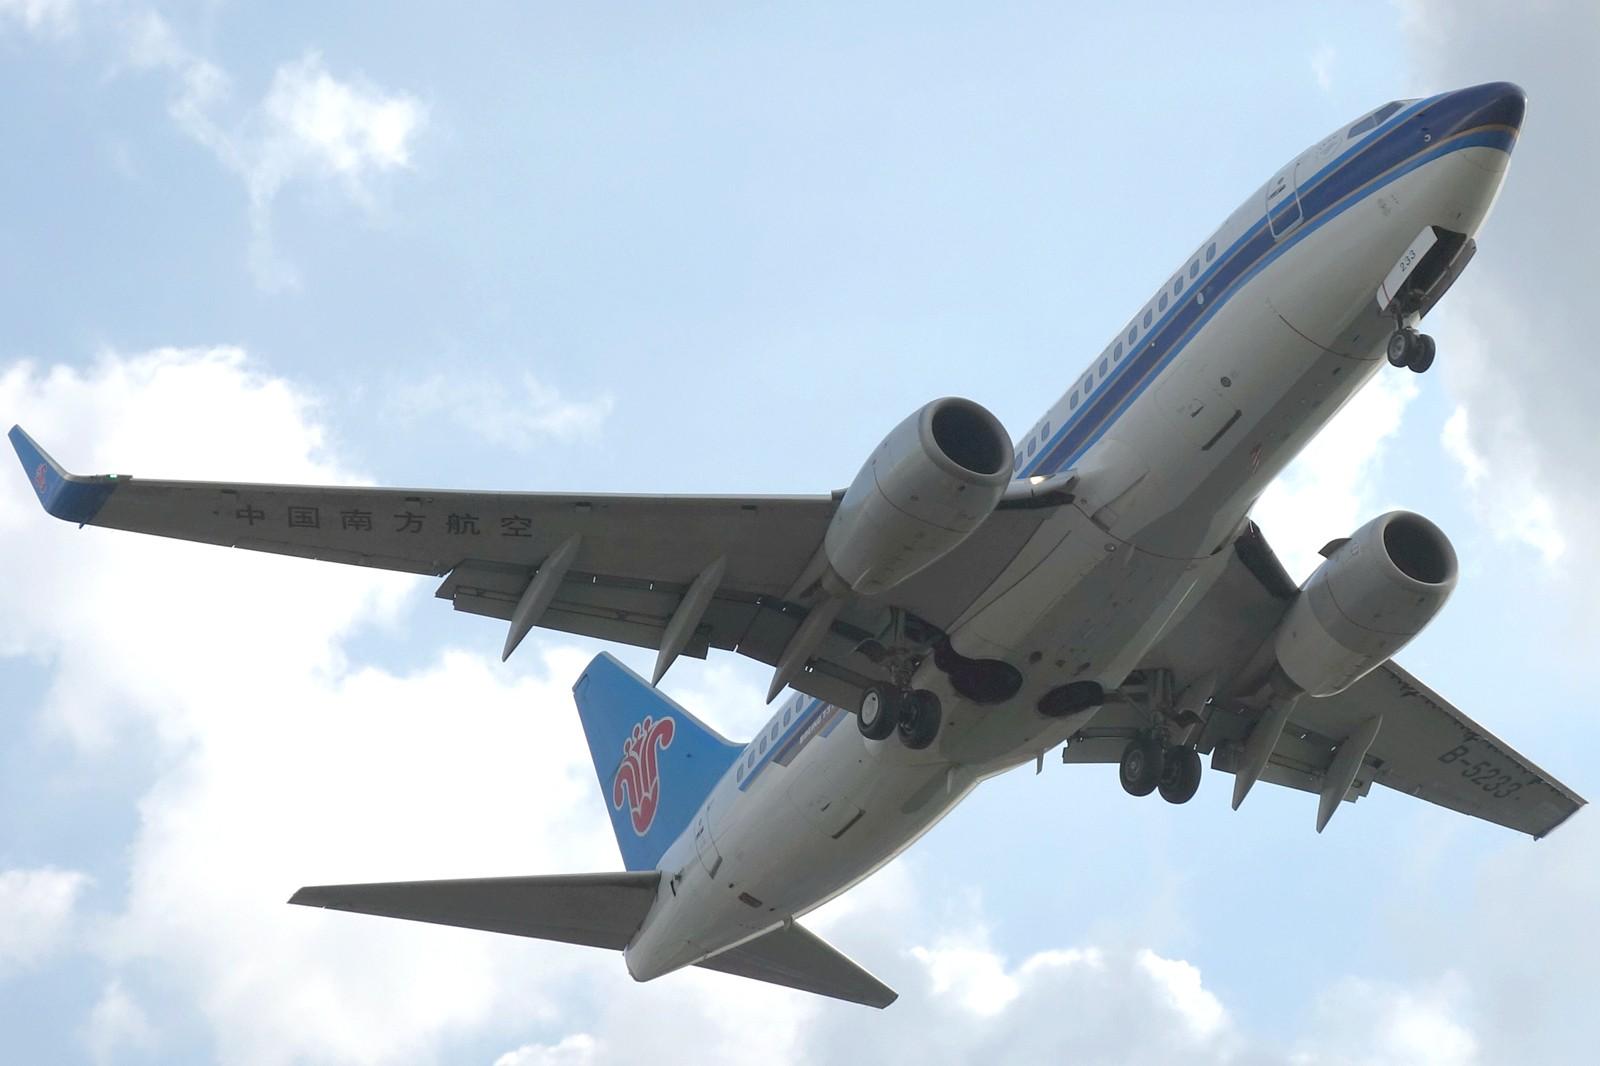 Re:[原创]【上海飞友会】ZSSS杂图一组 BOEING 737-700 B-5233 中国上海虹桥机场